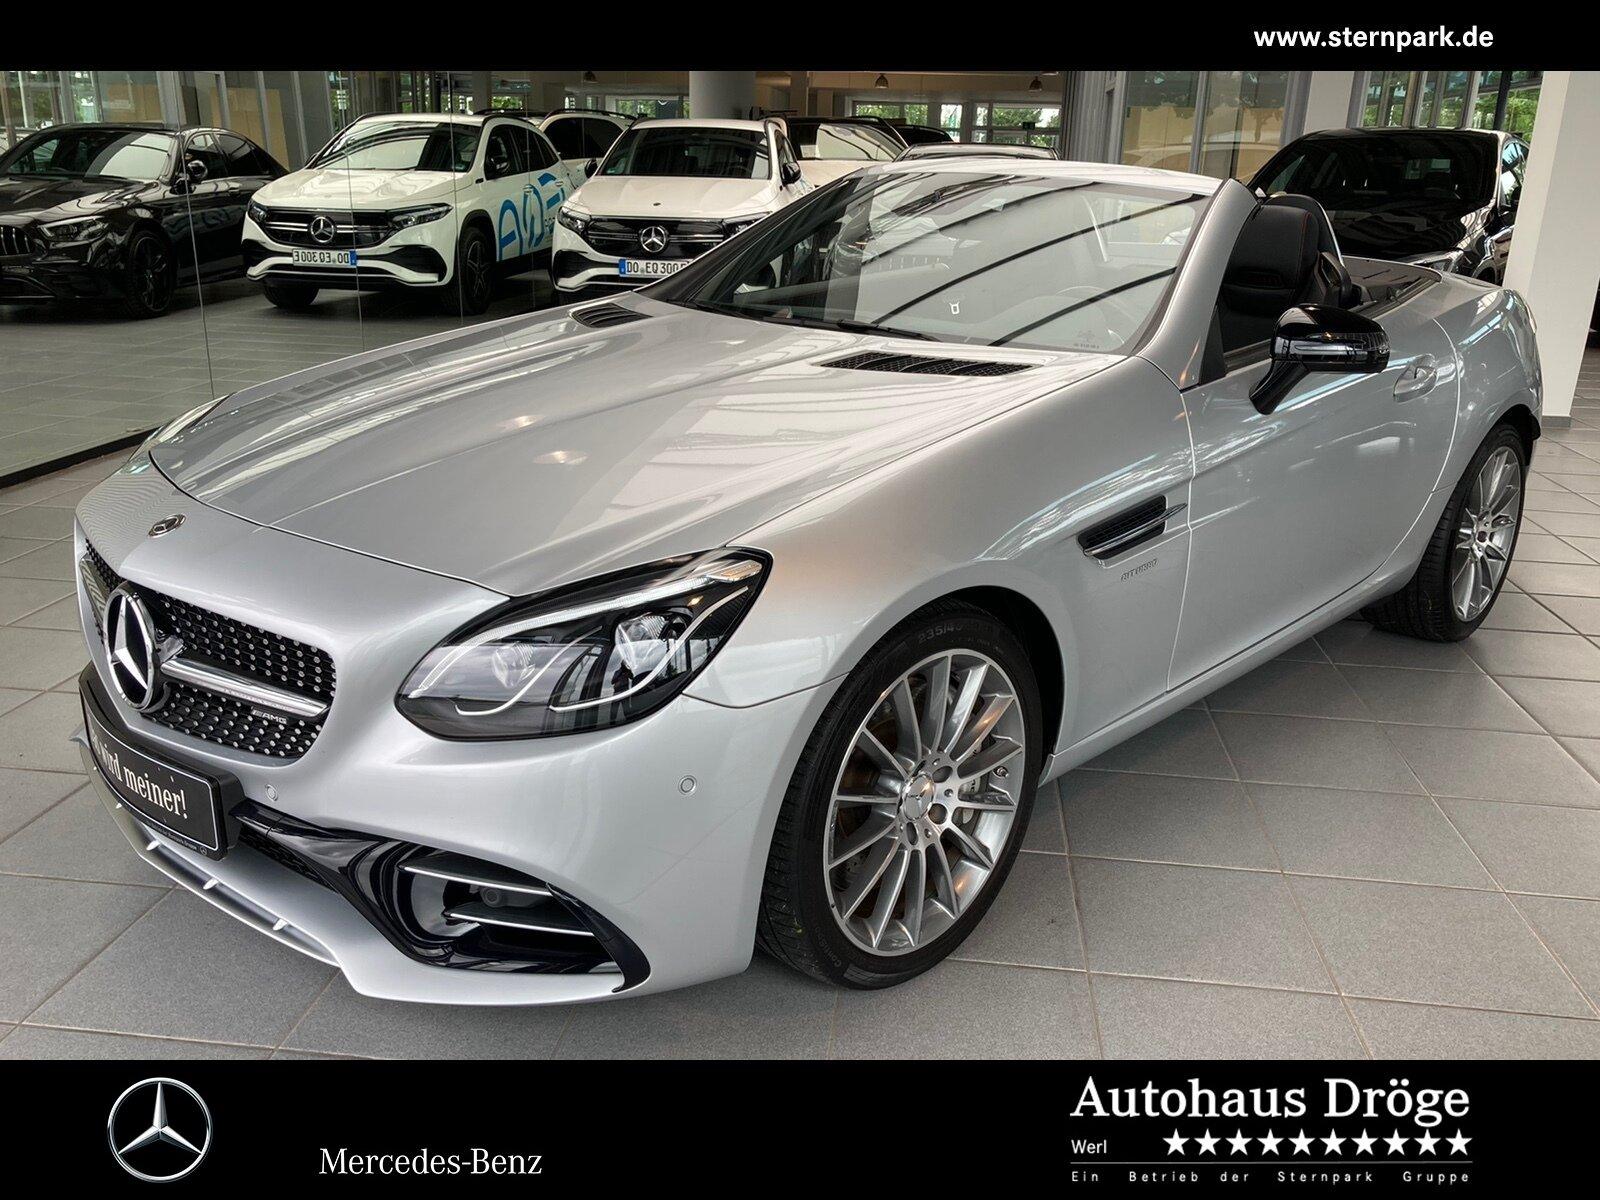 "Mercedes-Benz SLC 43 AMG Pano*Memory*H+K*LED*Navi*Airscarf*18"", Jahr 2017, petrol"